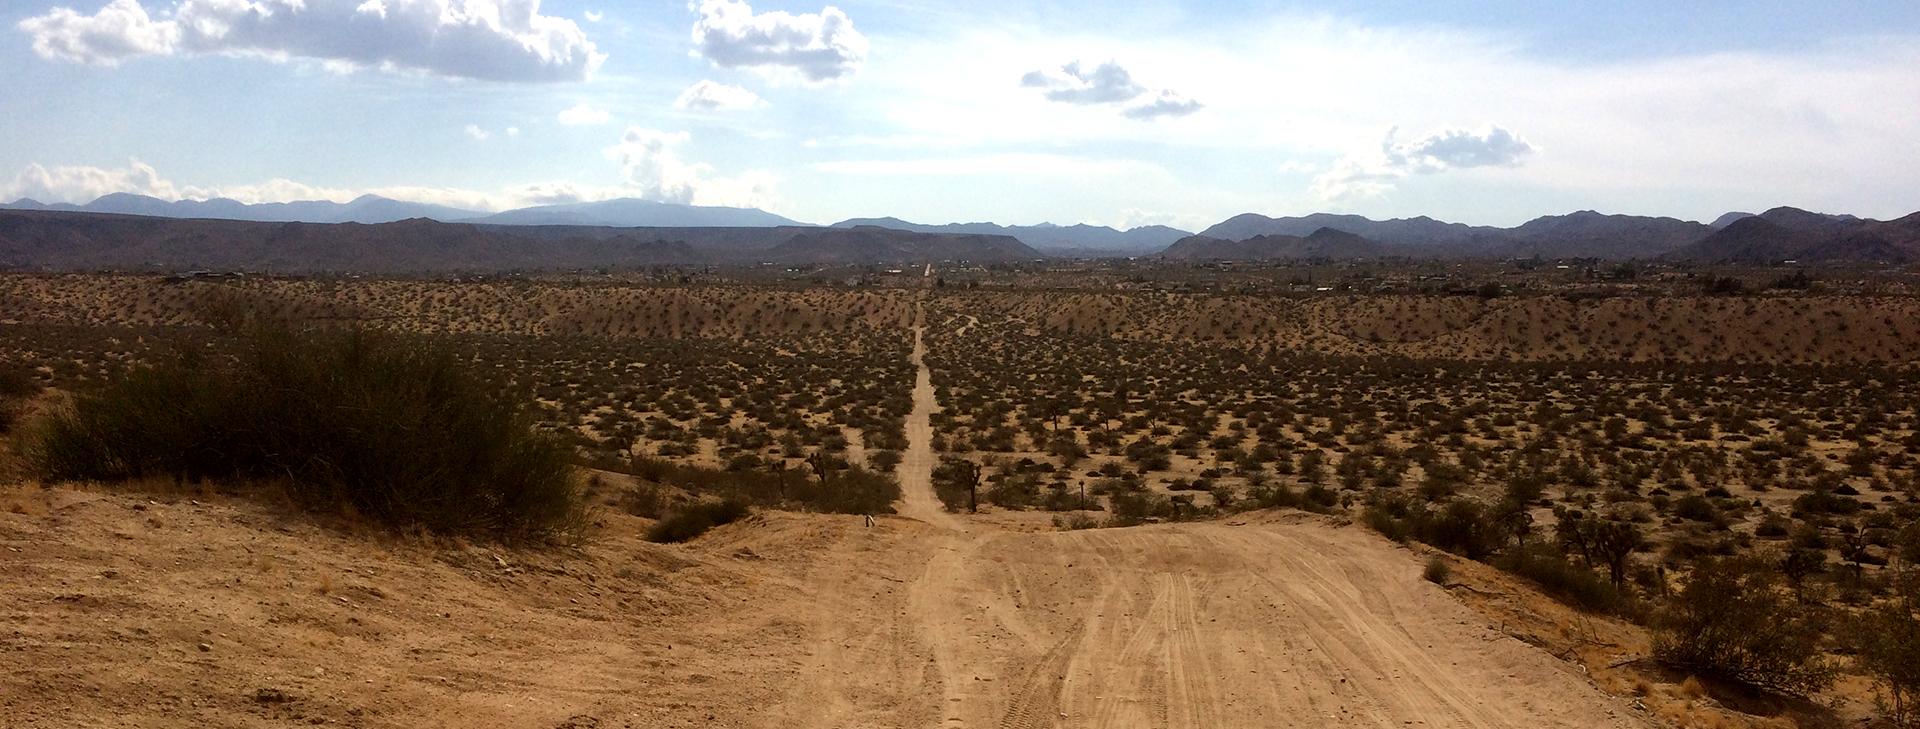 desertpath2.jpg